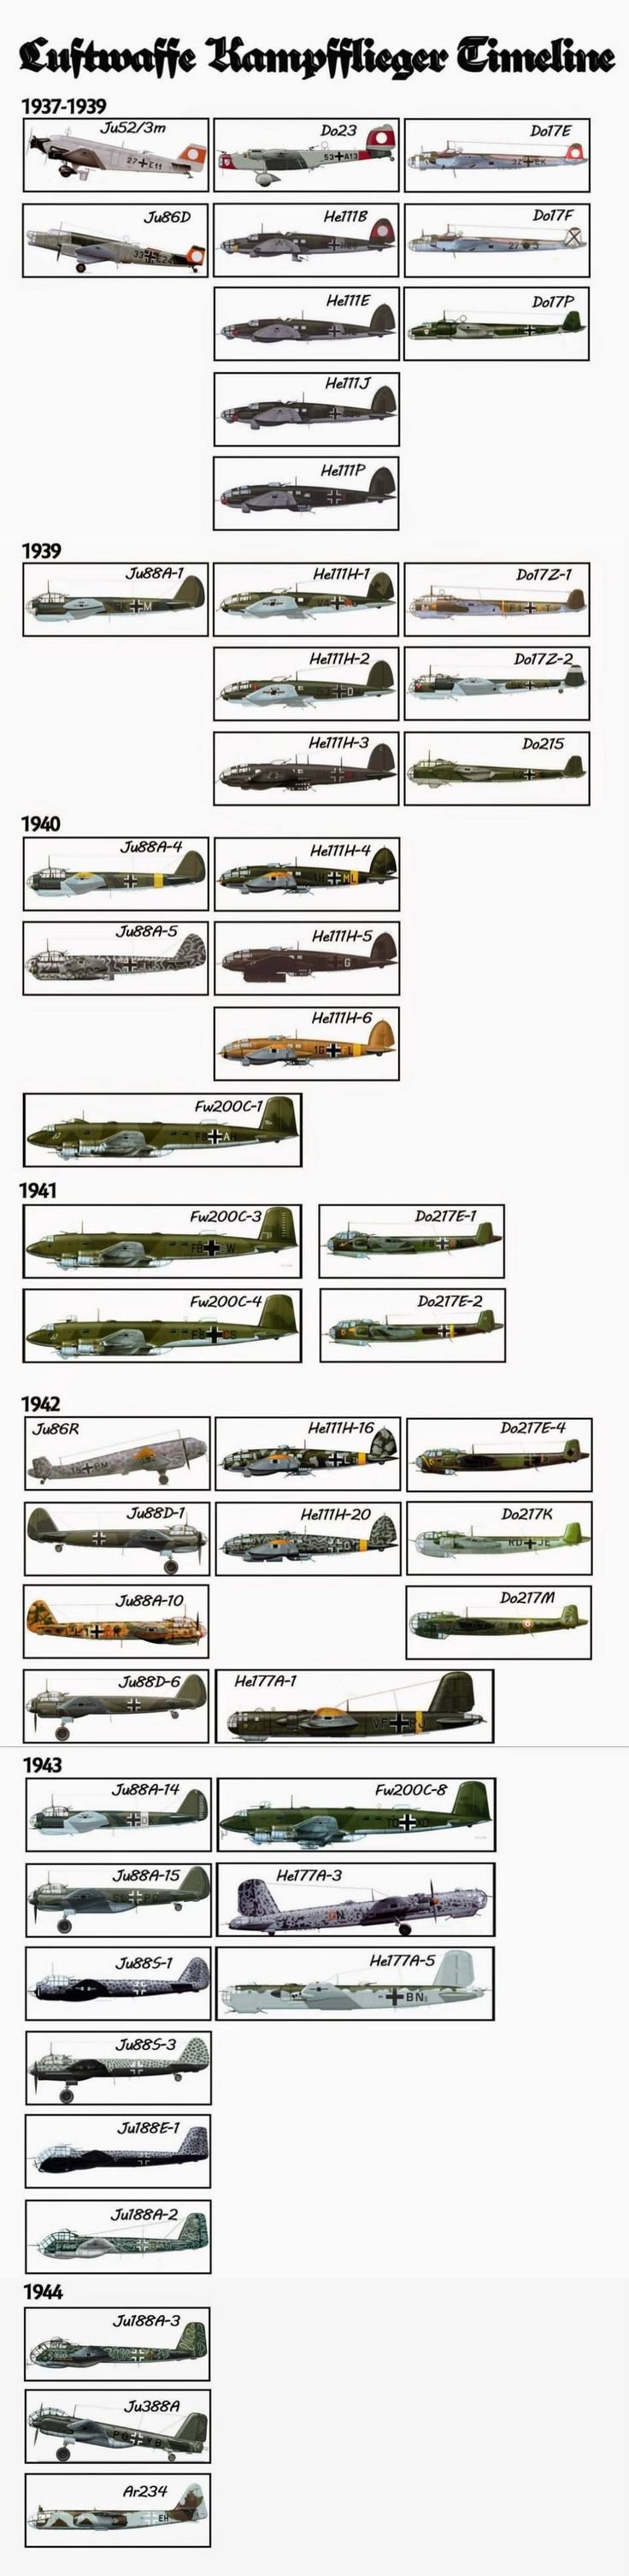 Bombarderos de la Luftwaffe